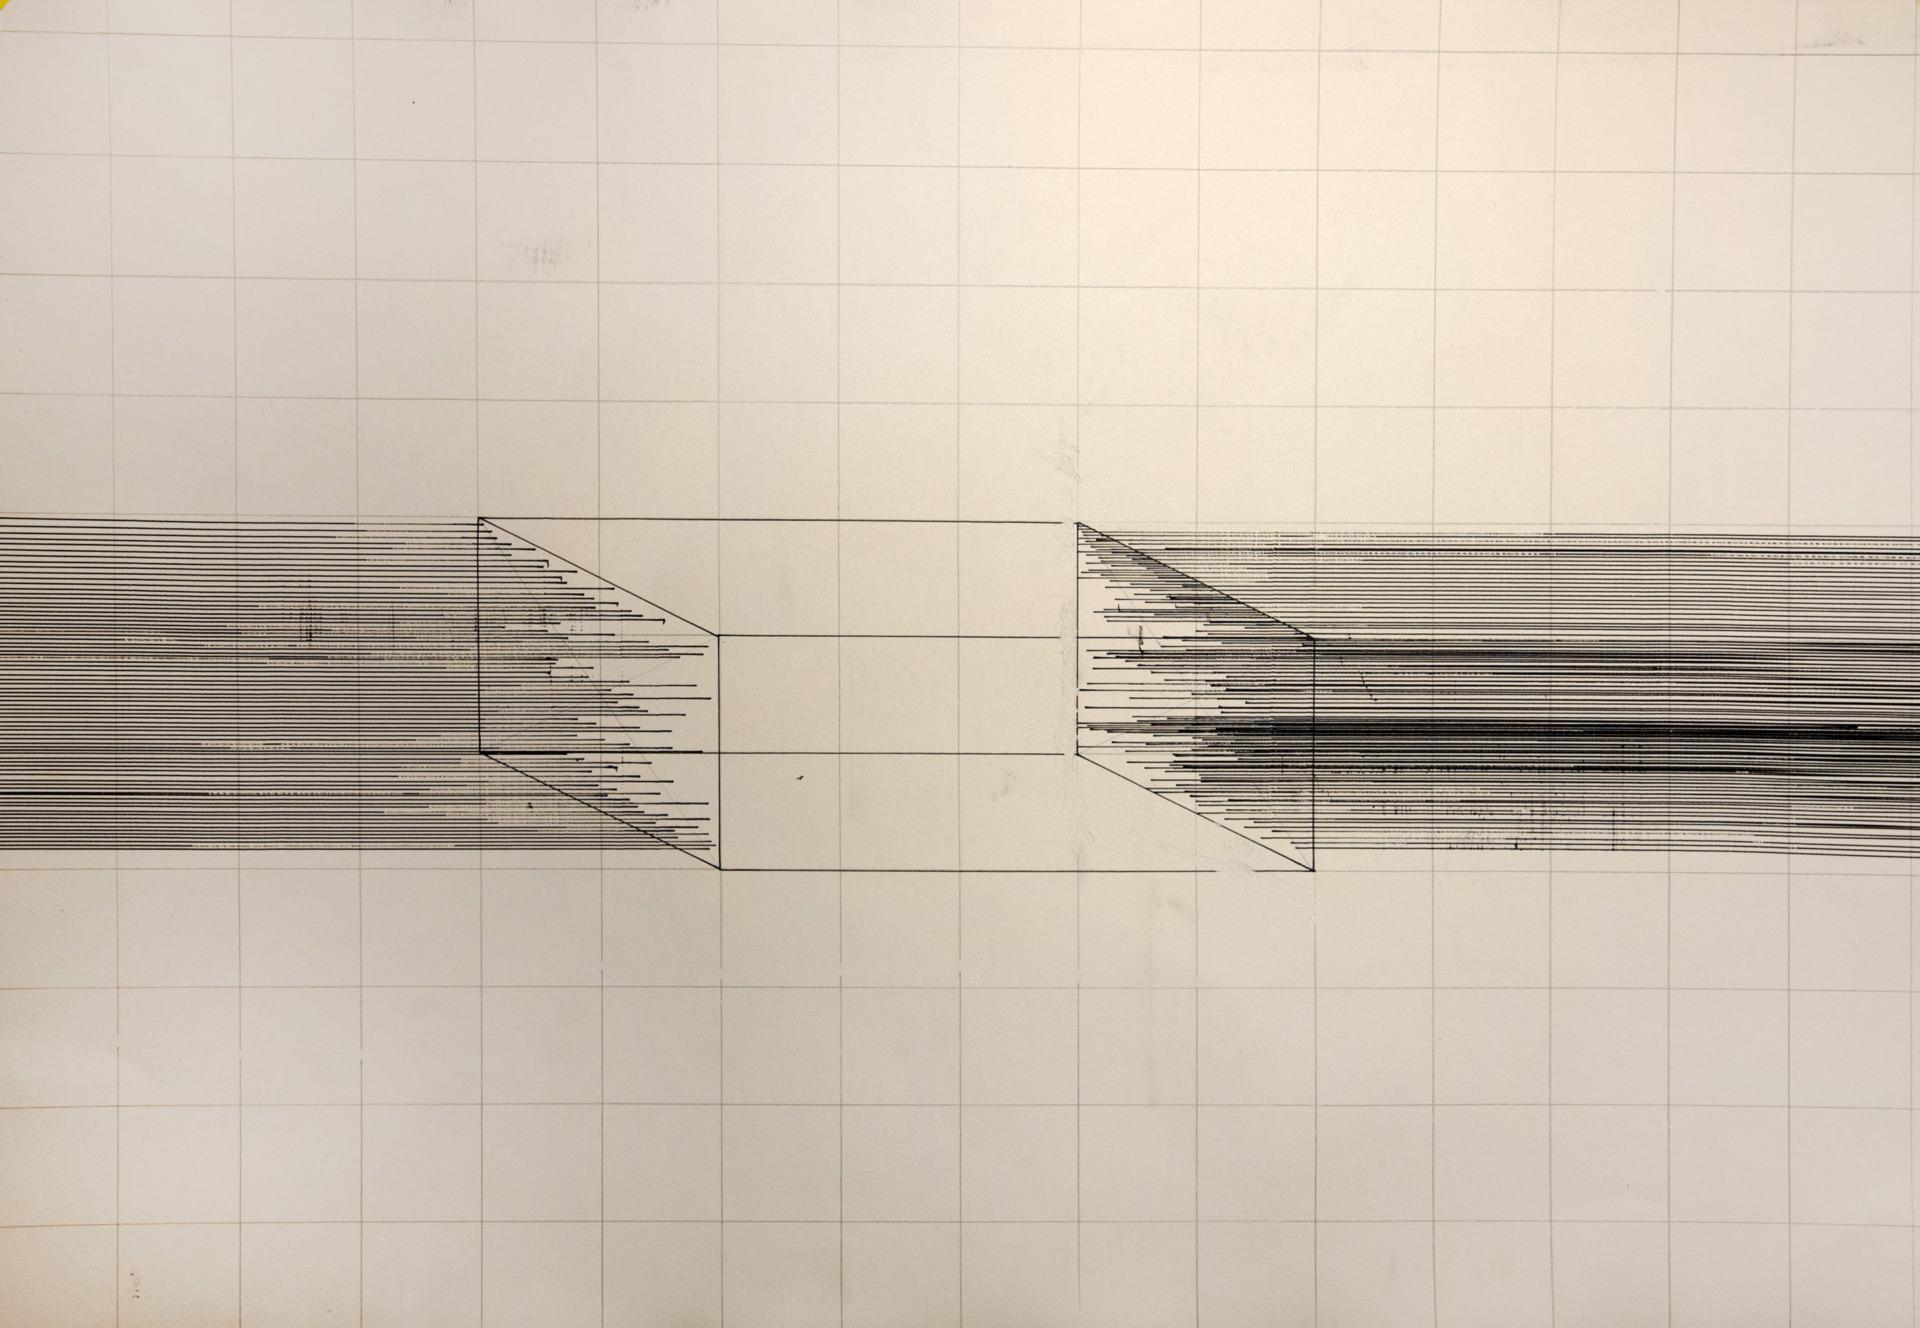 Contemporary art from Gyula Sági | Op.230920. 8